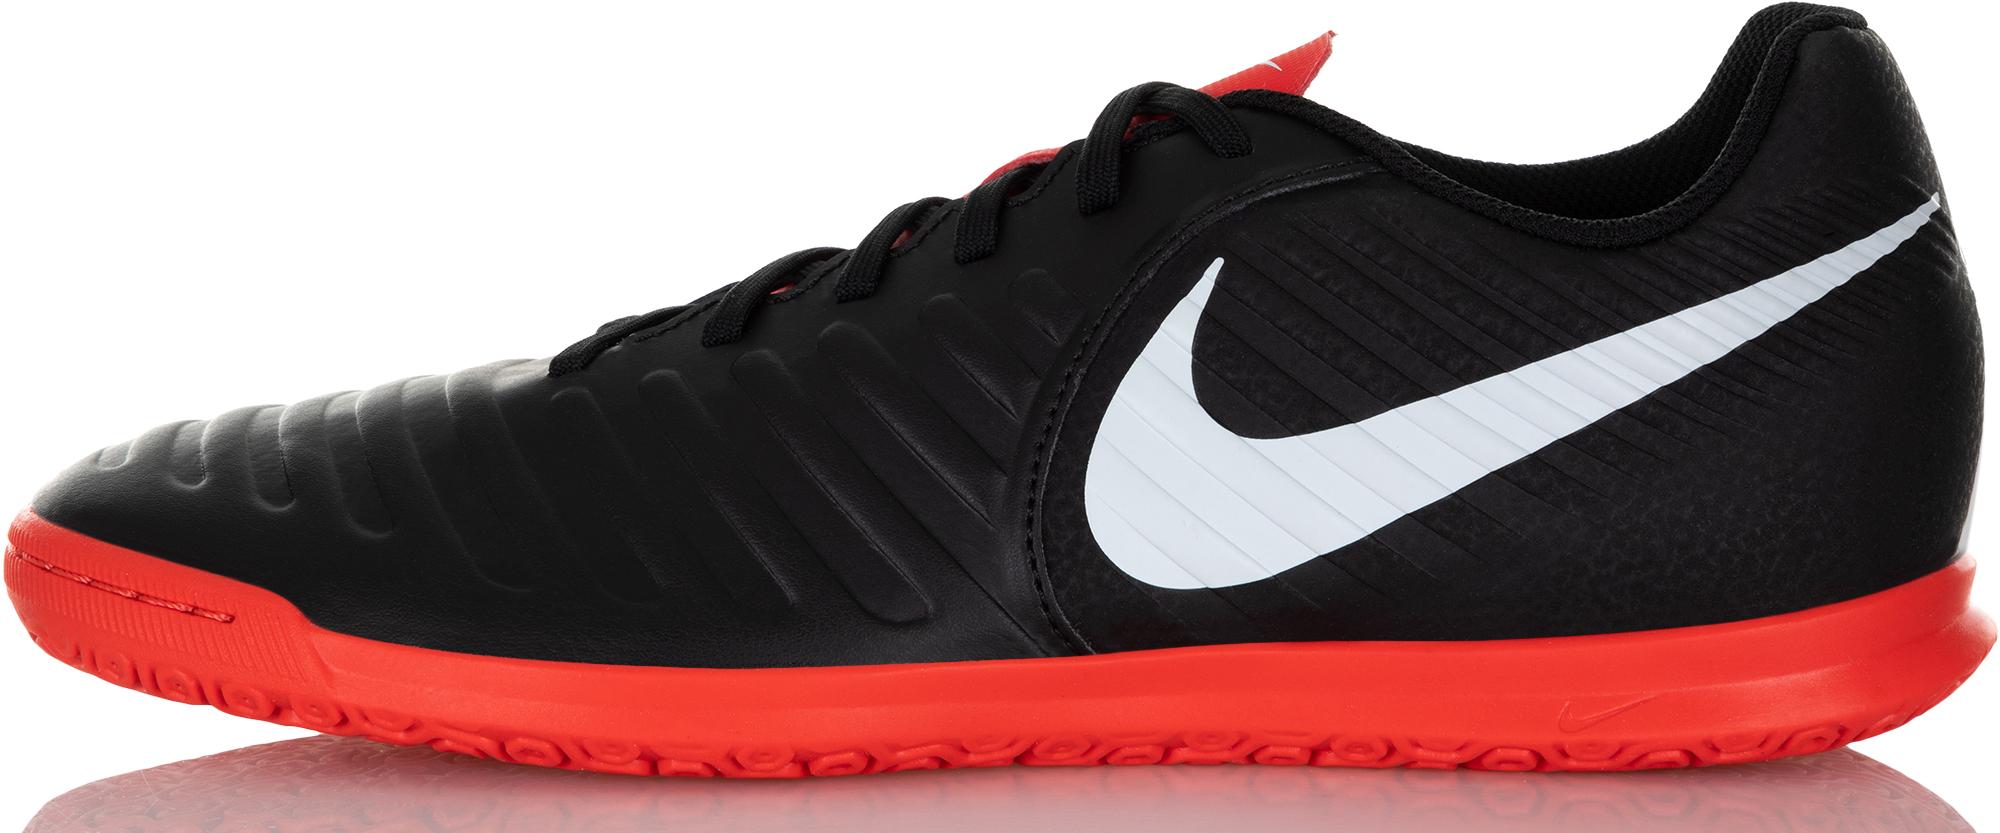 Nike Бутсы мужские Nike Tiempo LegendX 7 Club IC, размер 42